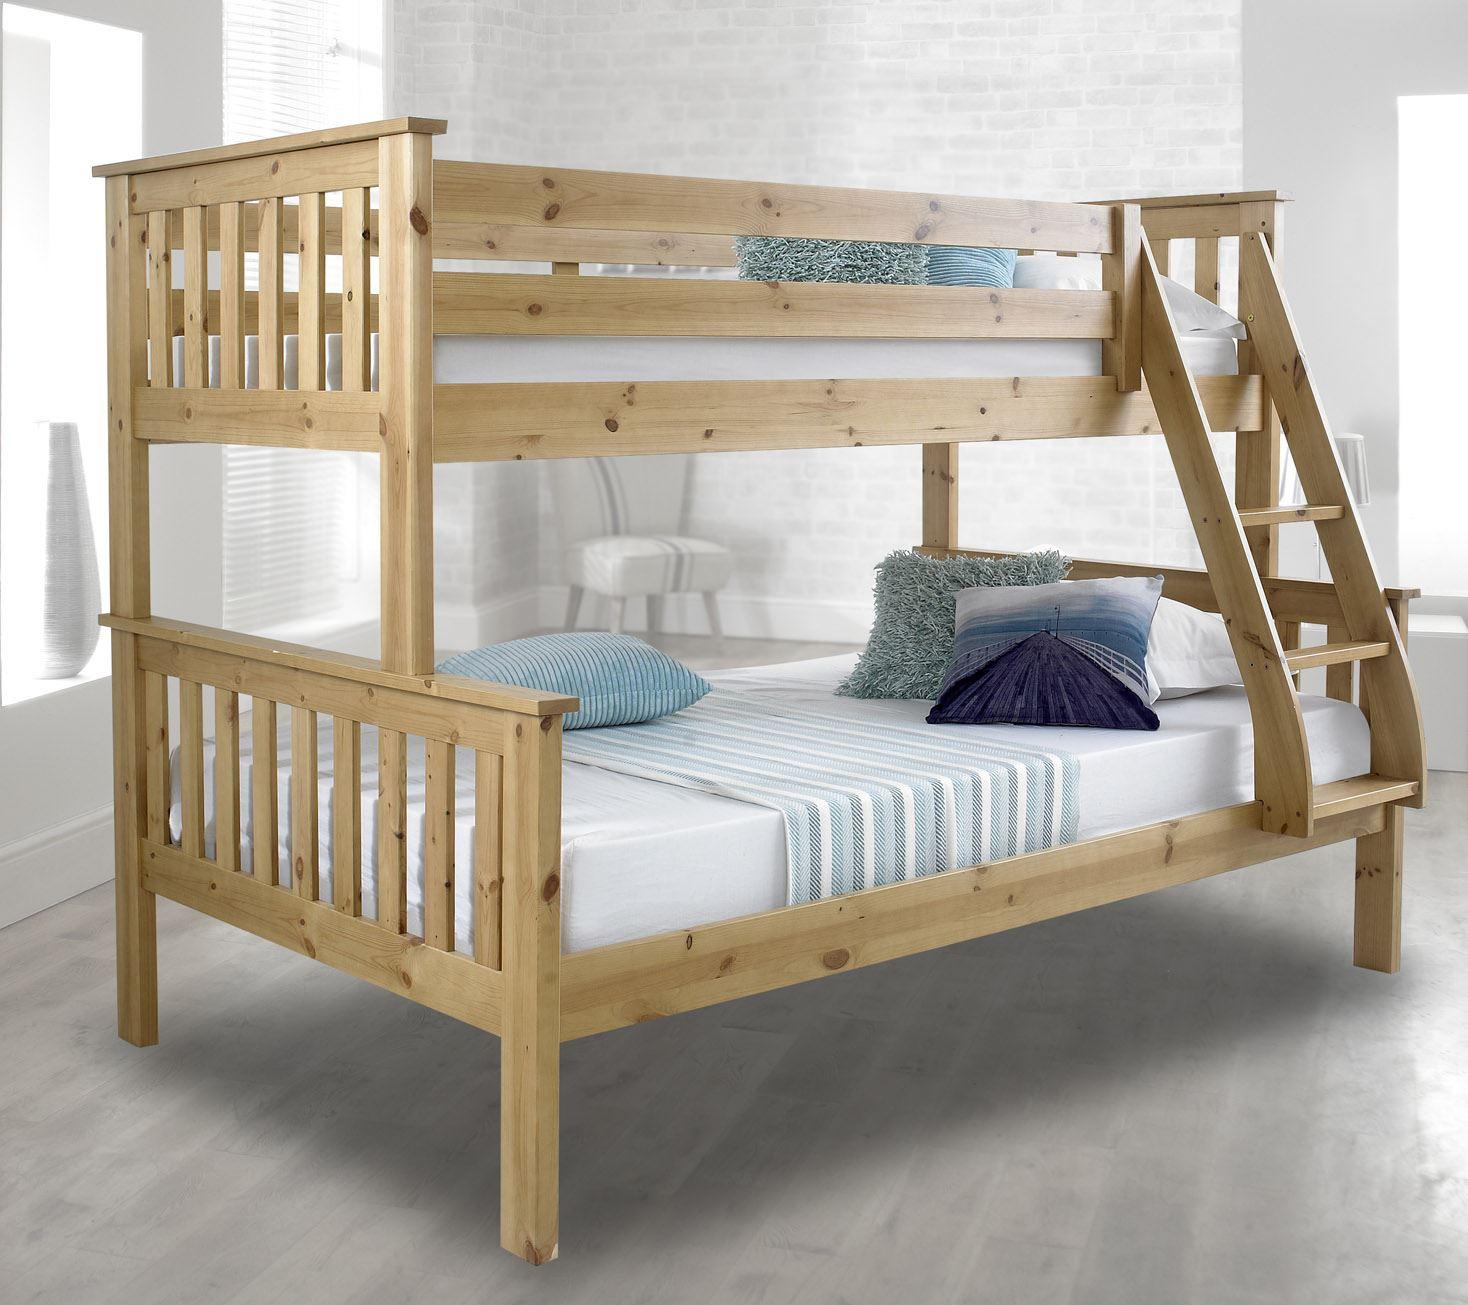 Happy beds atlantis solid wood triple sleeper bunk bed 3ft for Wooden bunk beds